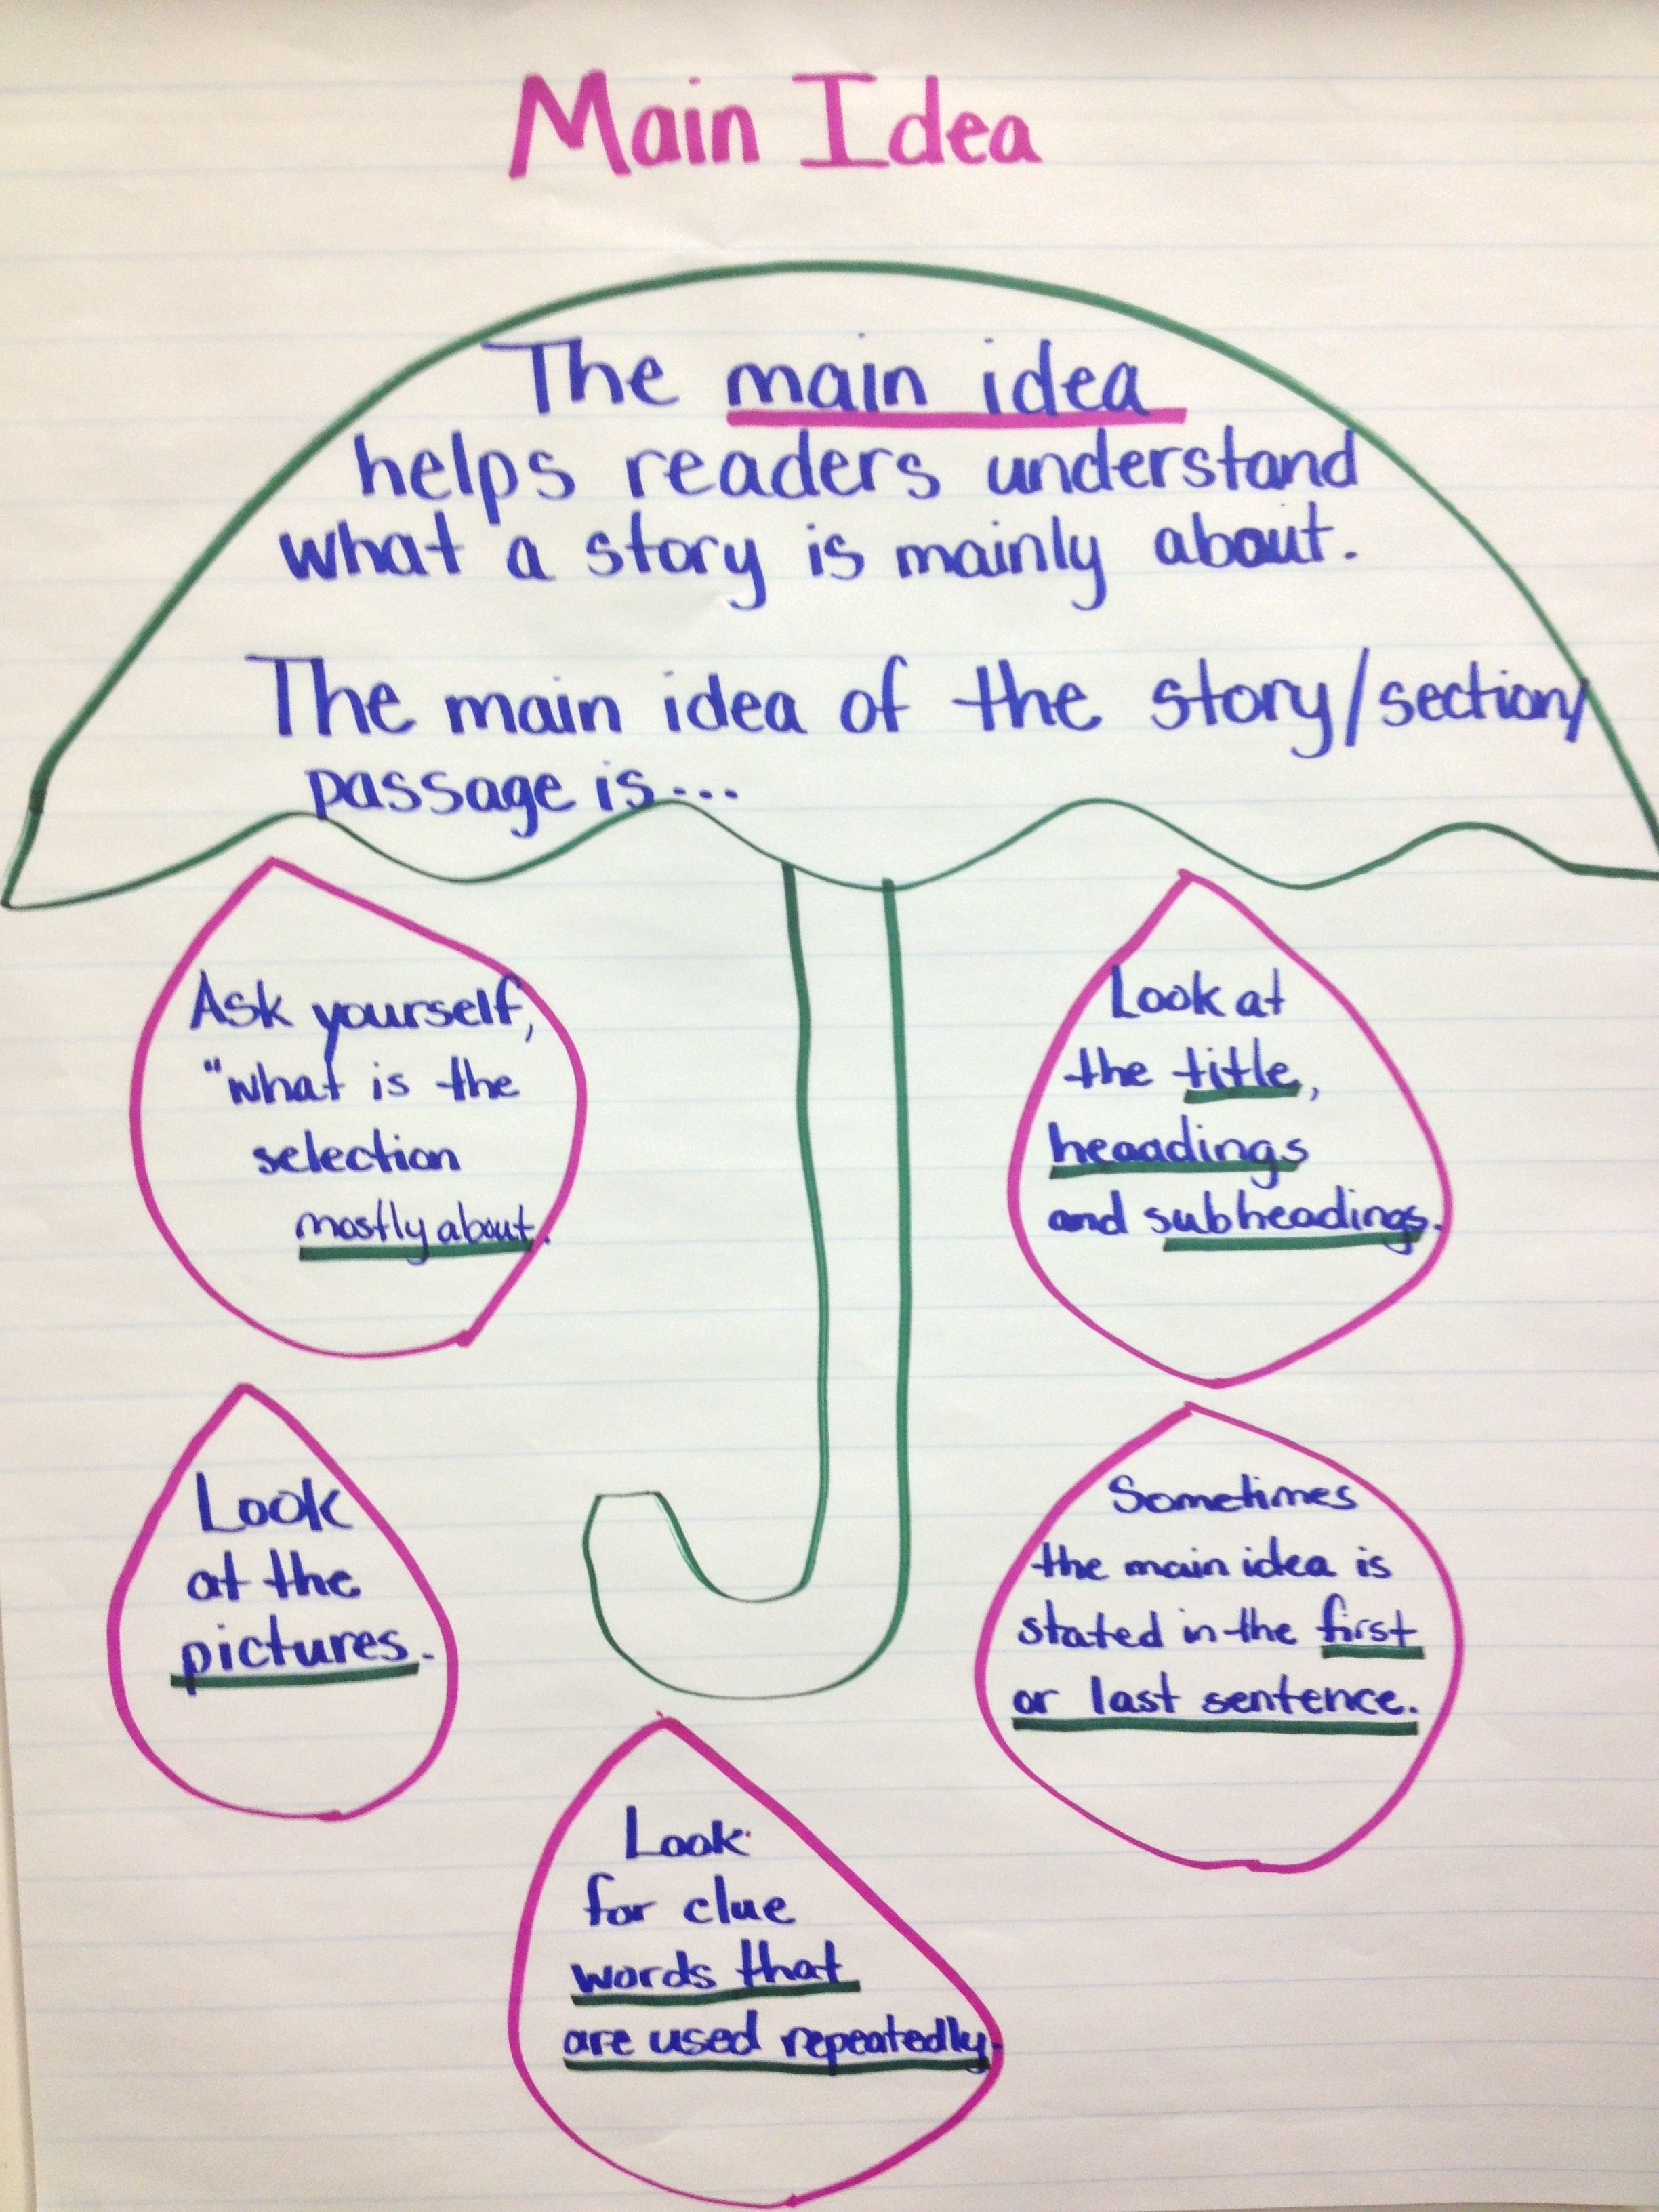 Main Idea Chart I Created For My Class Using The Umbrella Strategy